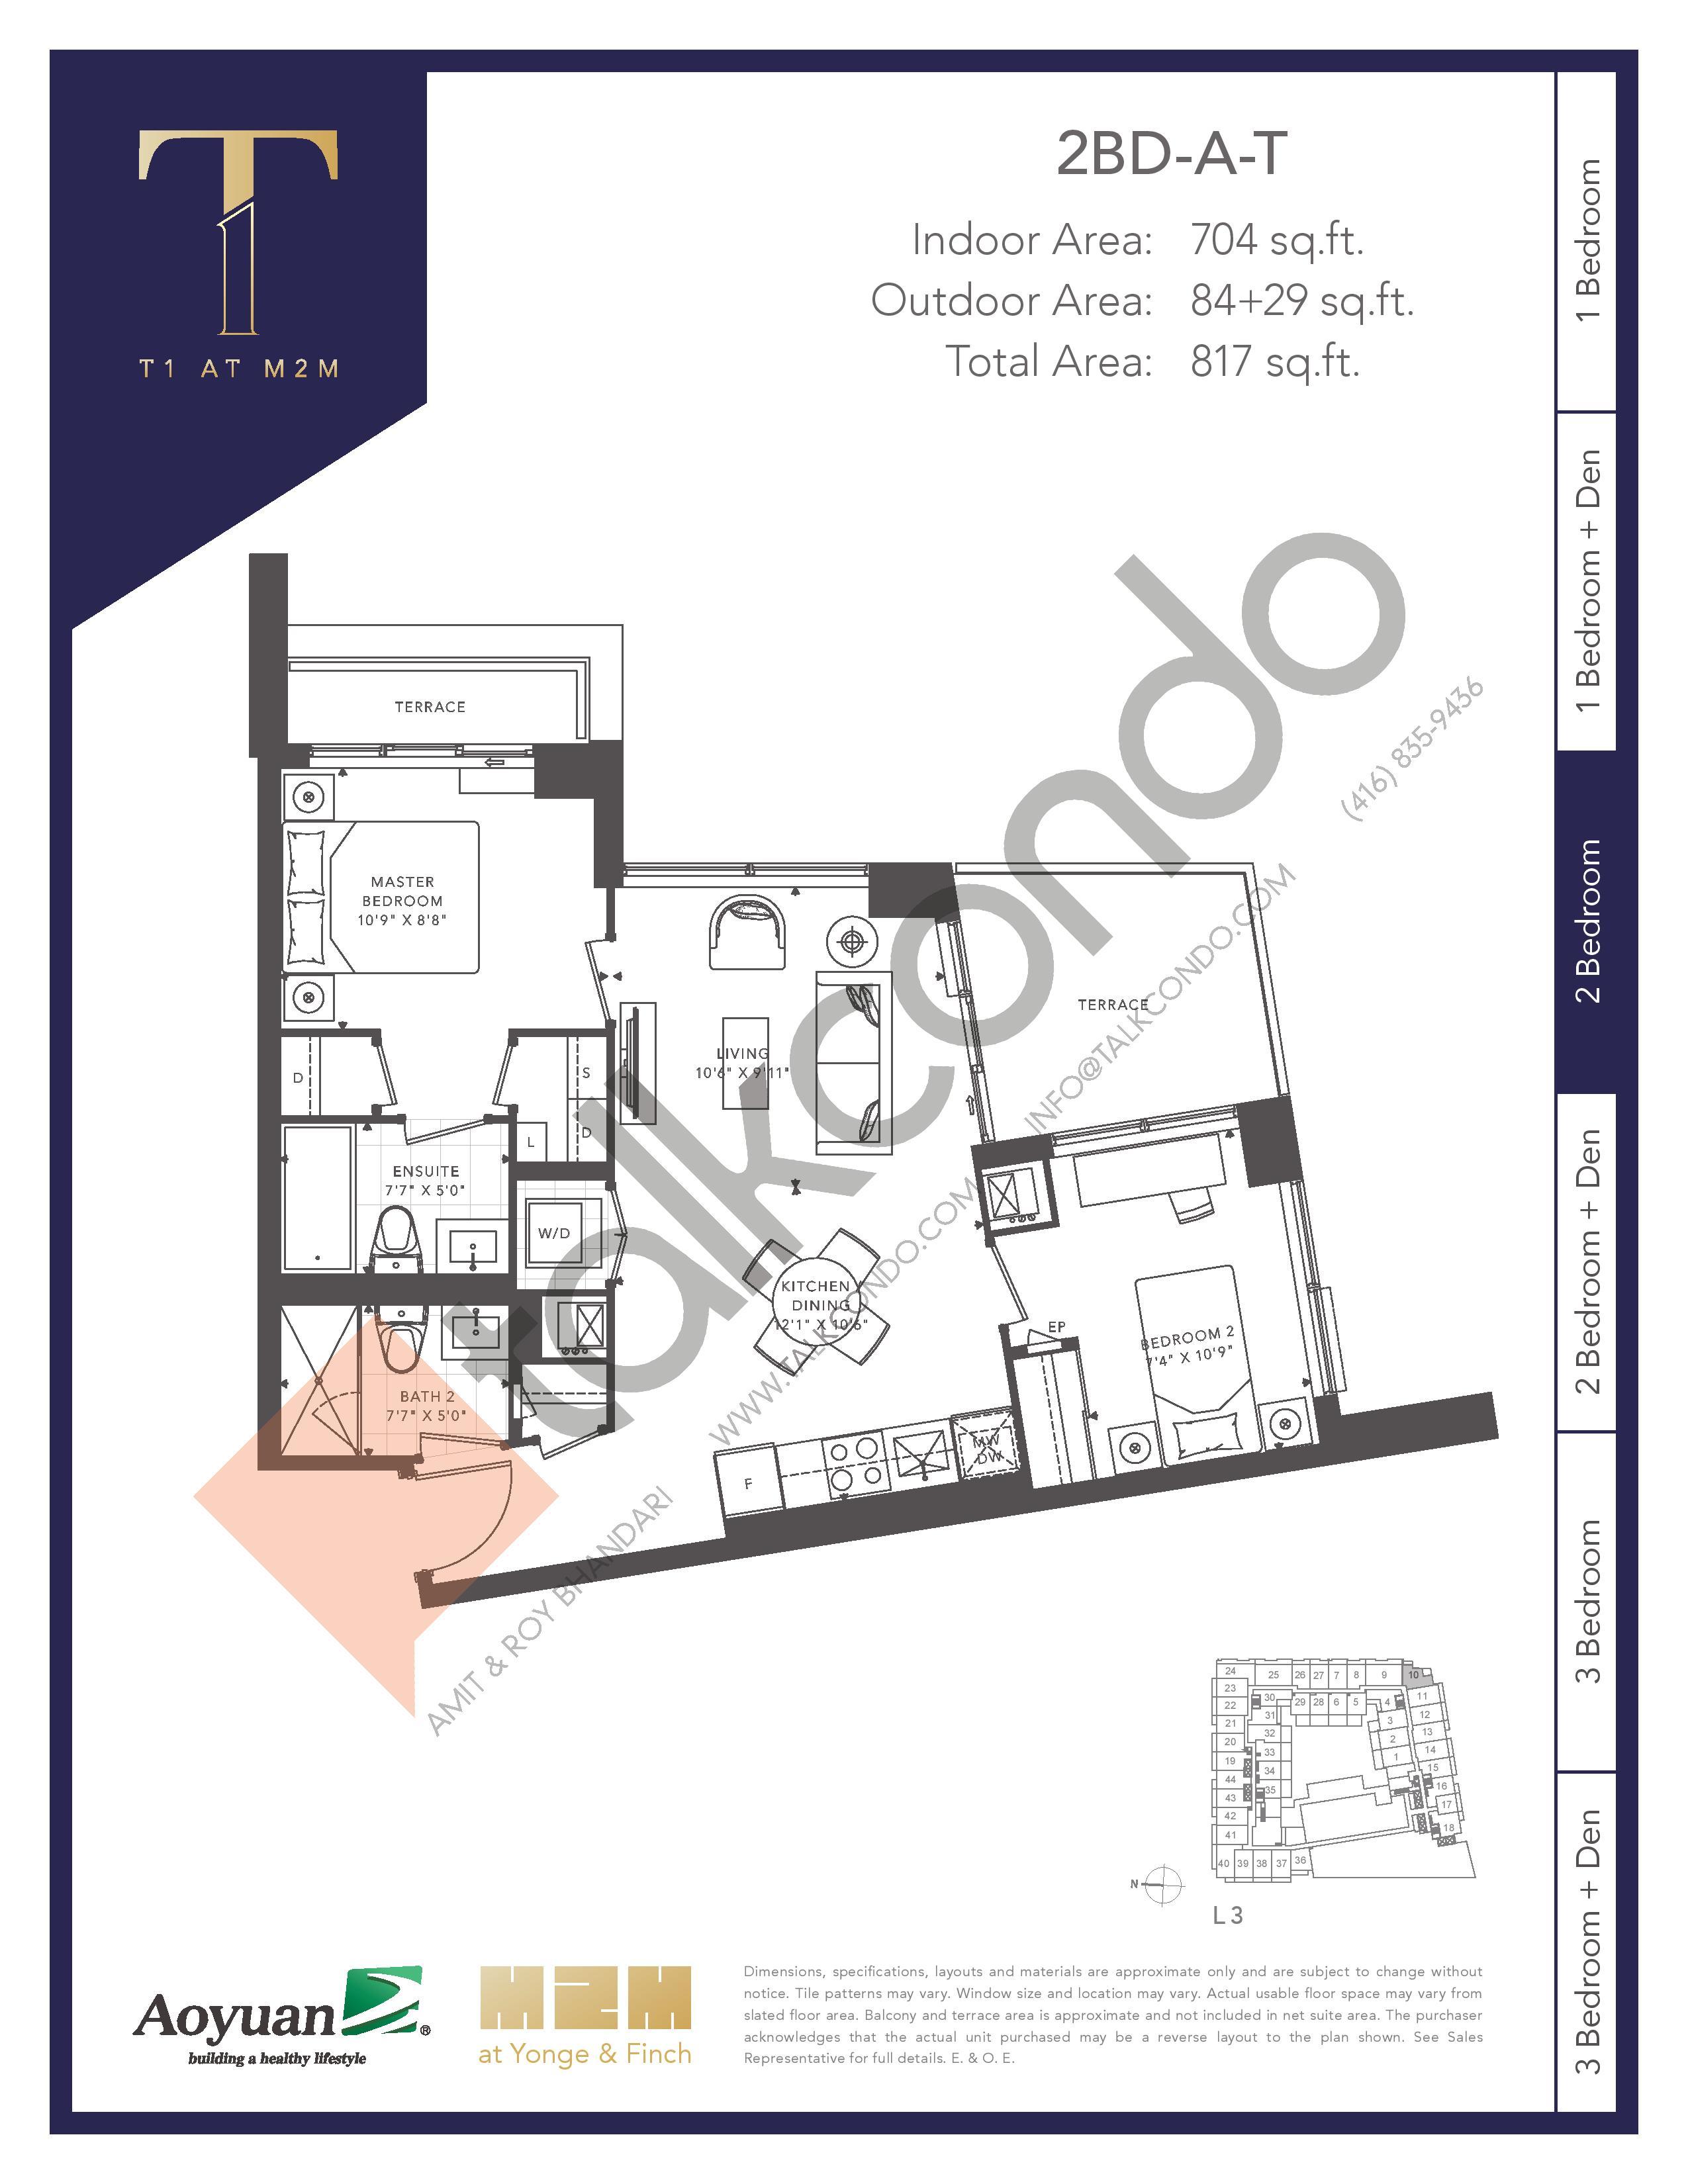 2BD-A-T (Tower) Floor Plan at T1 at M2M Condos - 704 sq.ft